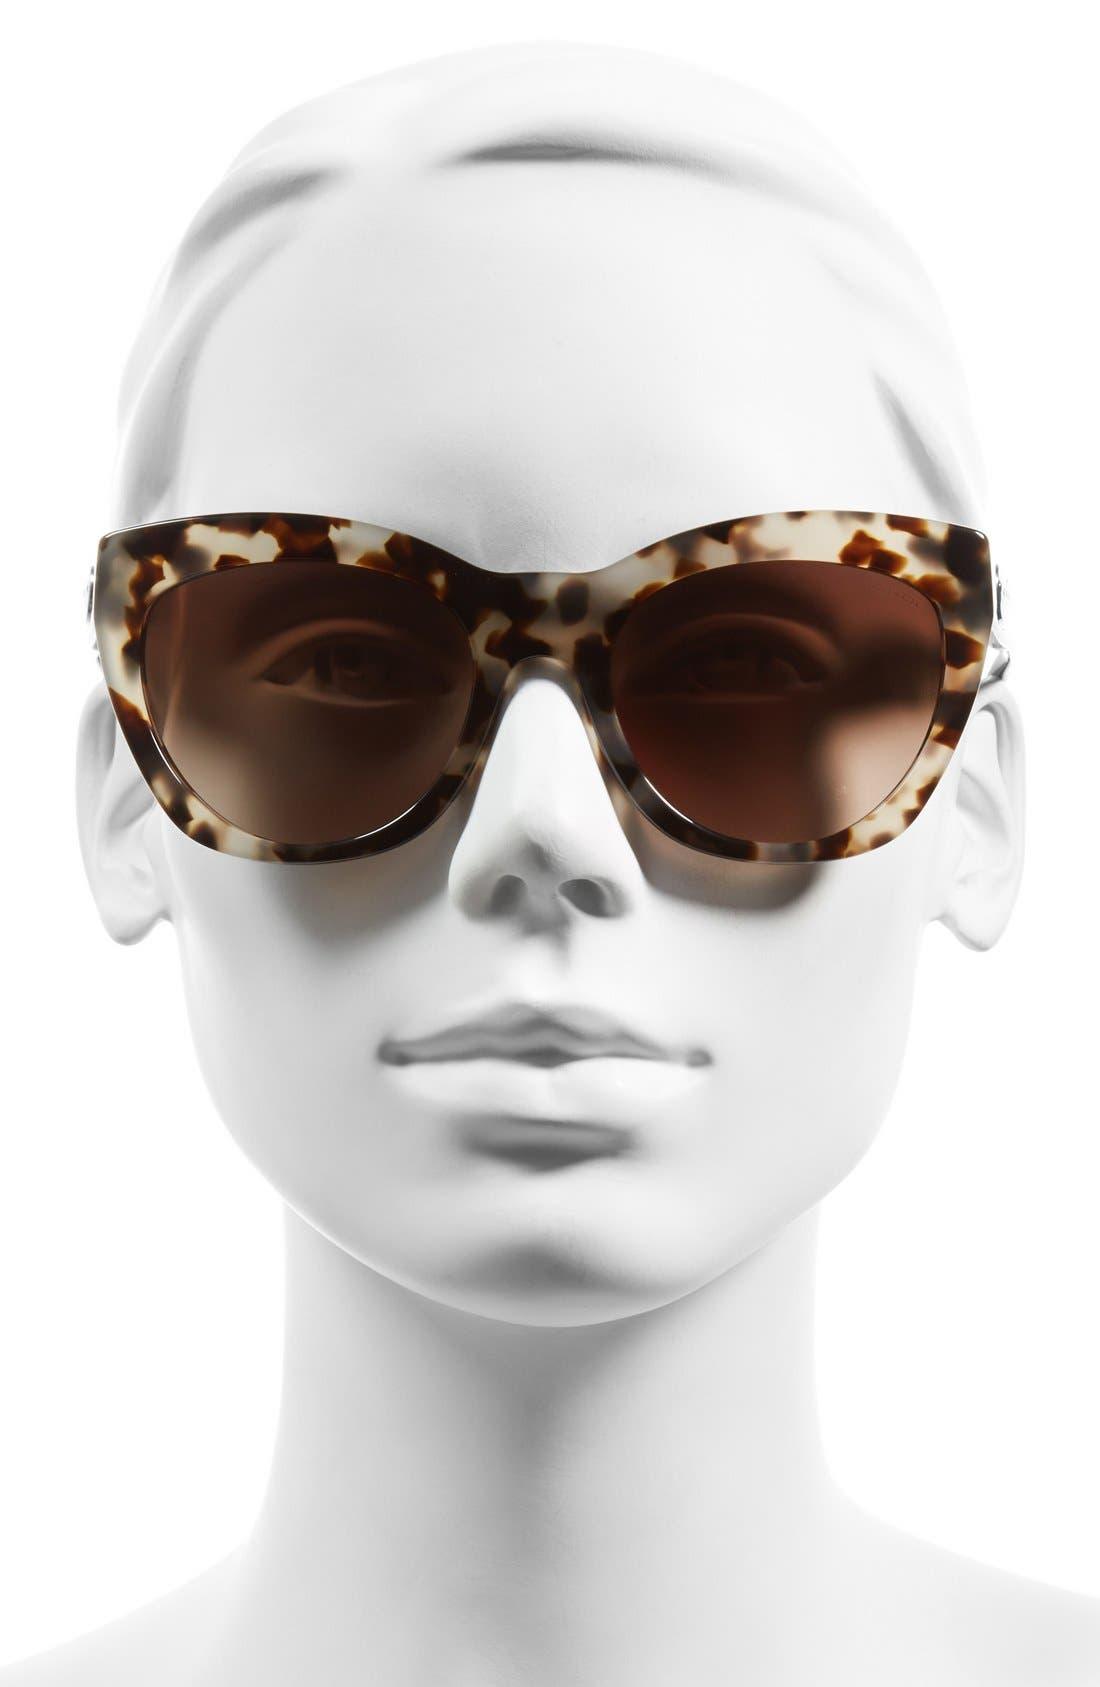 54mm Retro Sunglasses,                             Alternate thumbnail 2, color,                             Light Tortoise